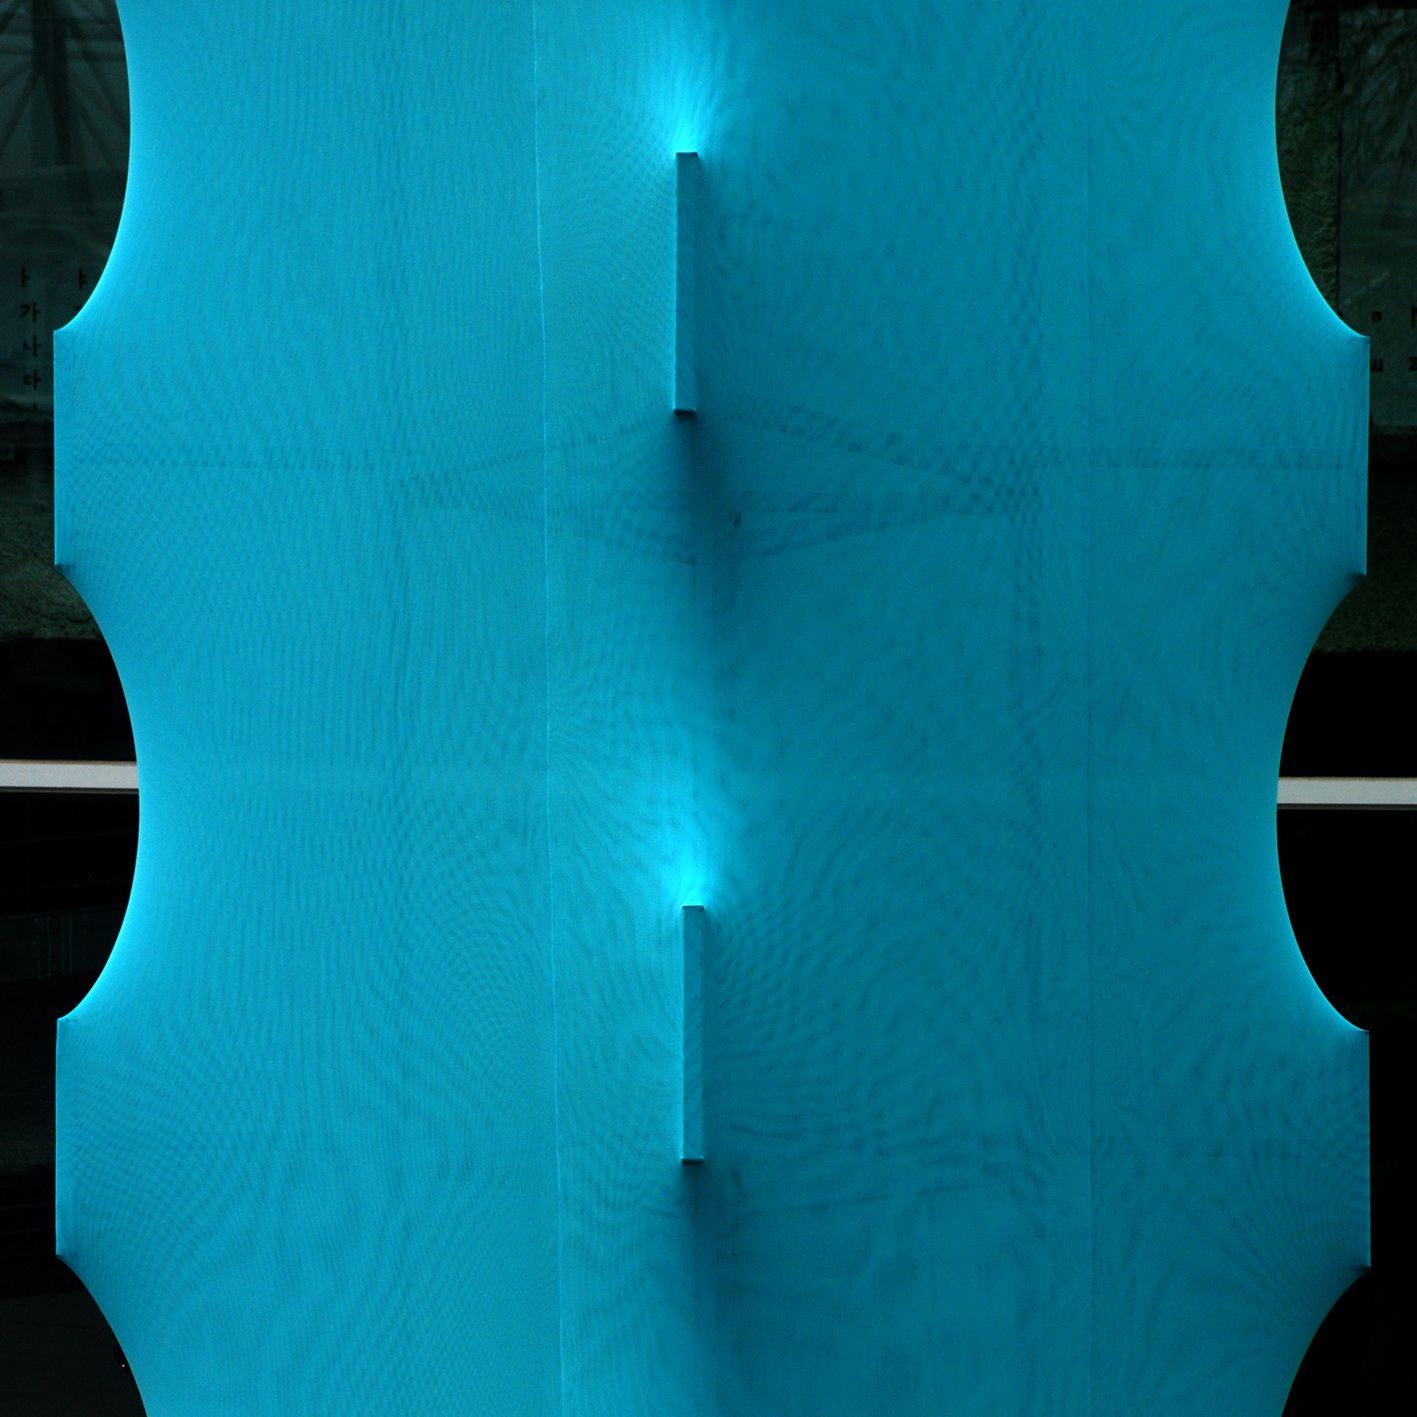 65 blue spike clue detail.jpg